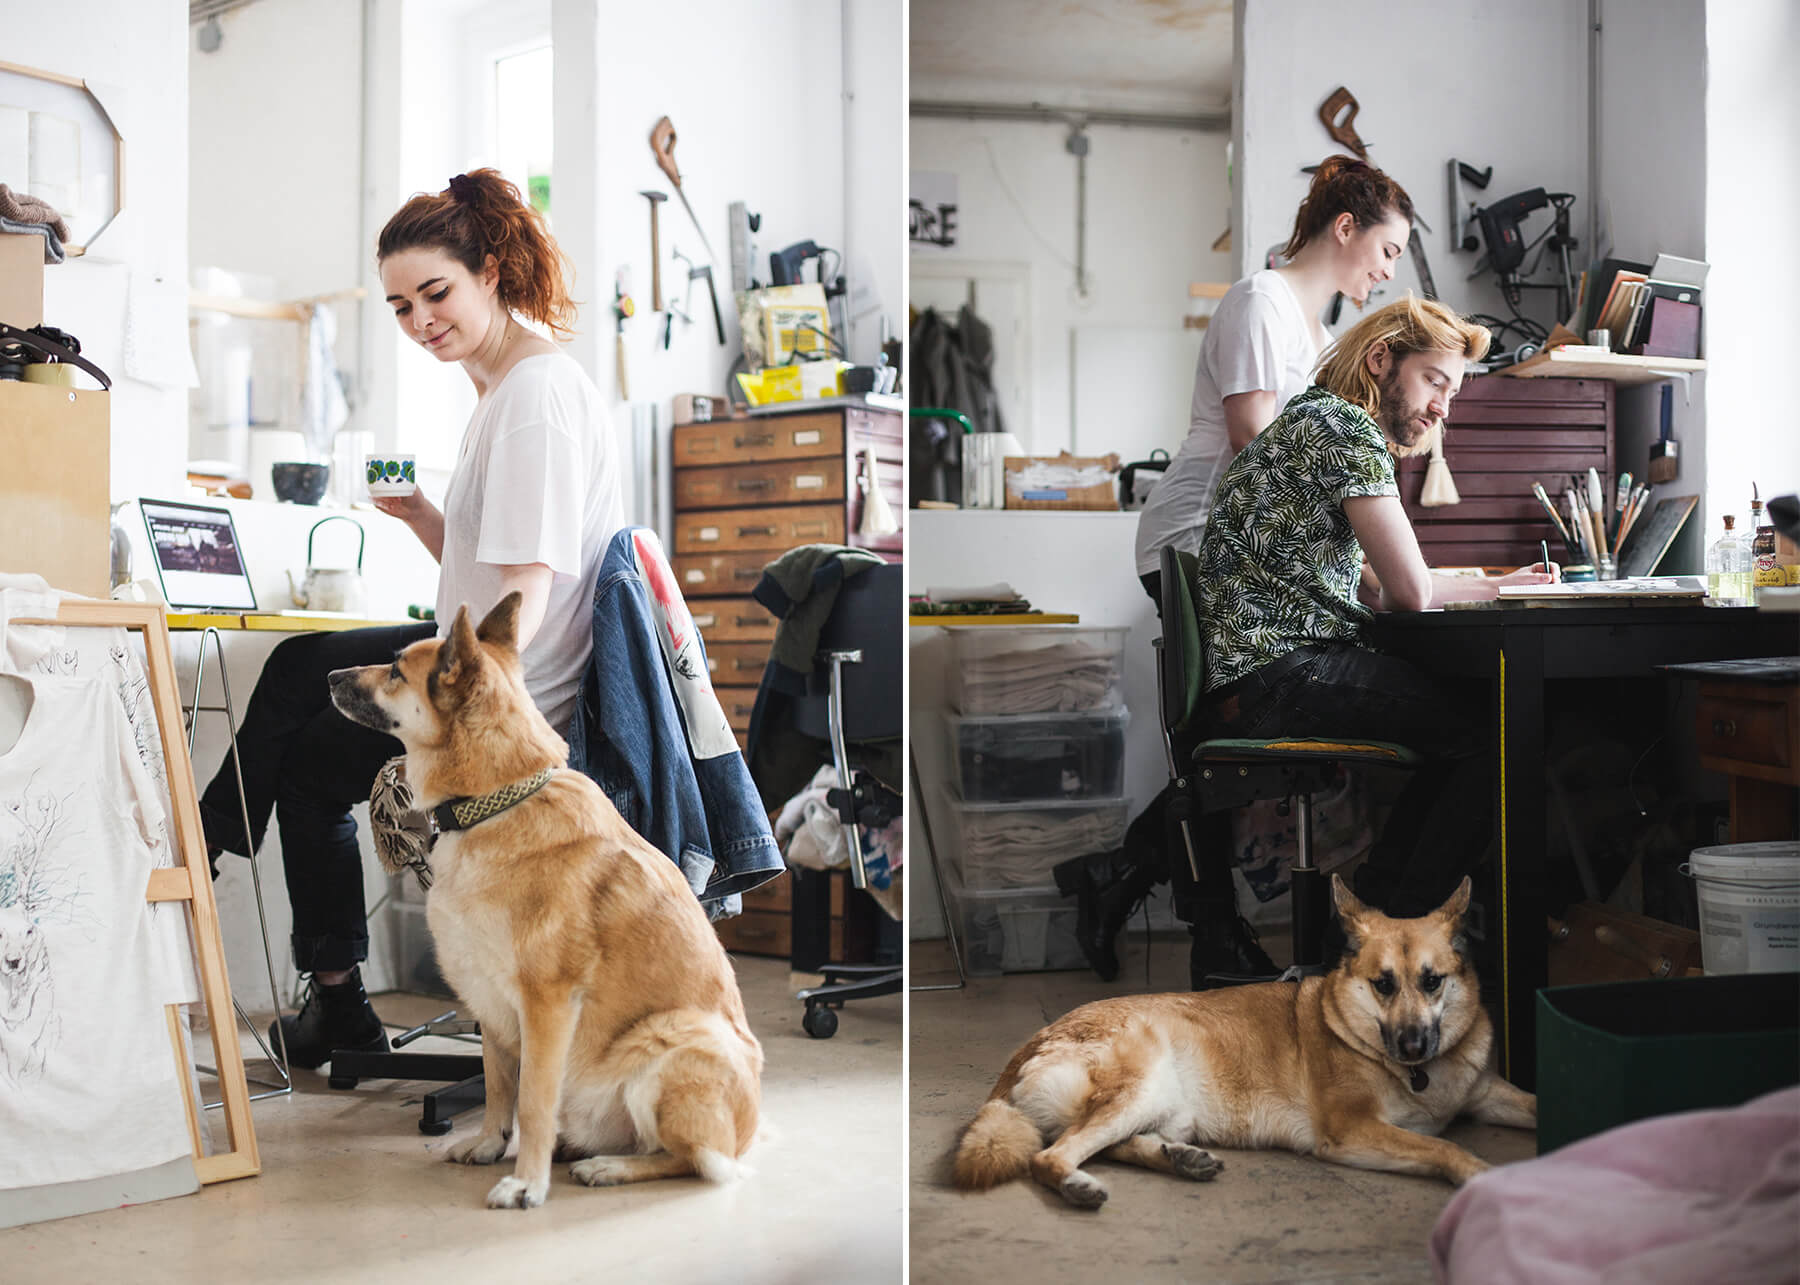 Die_Stadthunde_Fuxherz_Portrait_Jolly_Schwarz_Alexandra_Stalzer_Wien_Hunde_Stadt